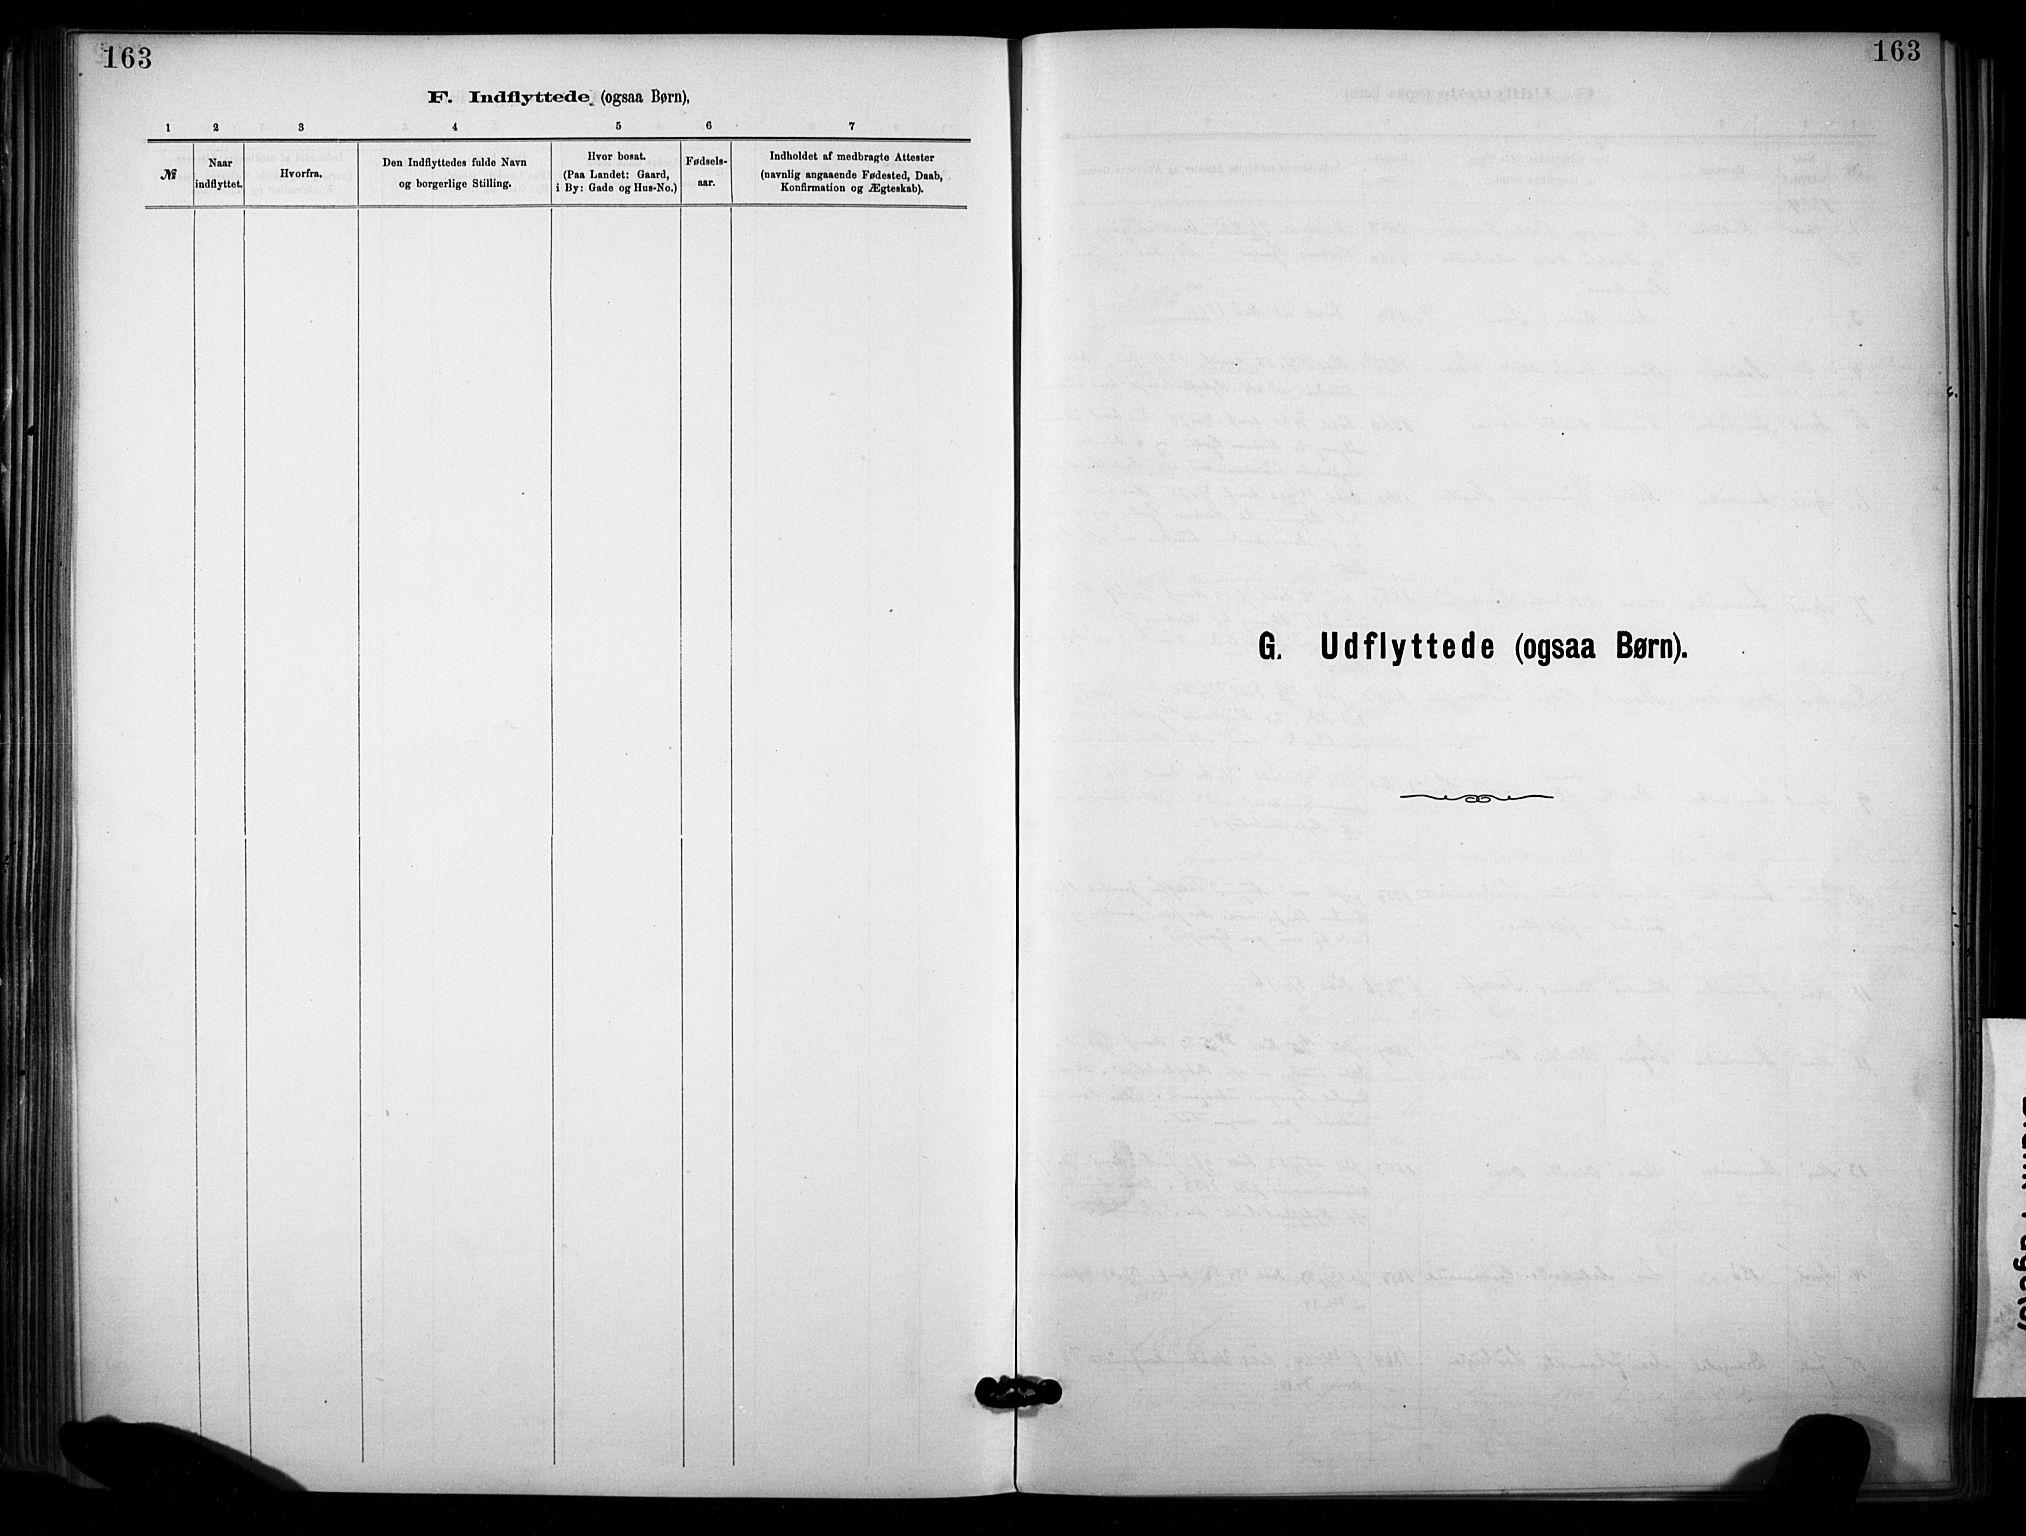 SAKO, Lunde kirkebøker, F/Fa/L0002: Ministerialbok nr. I 2, 1884-1892, s. 163